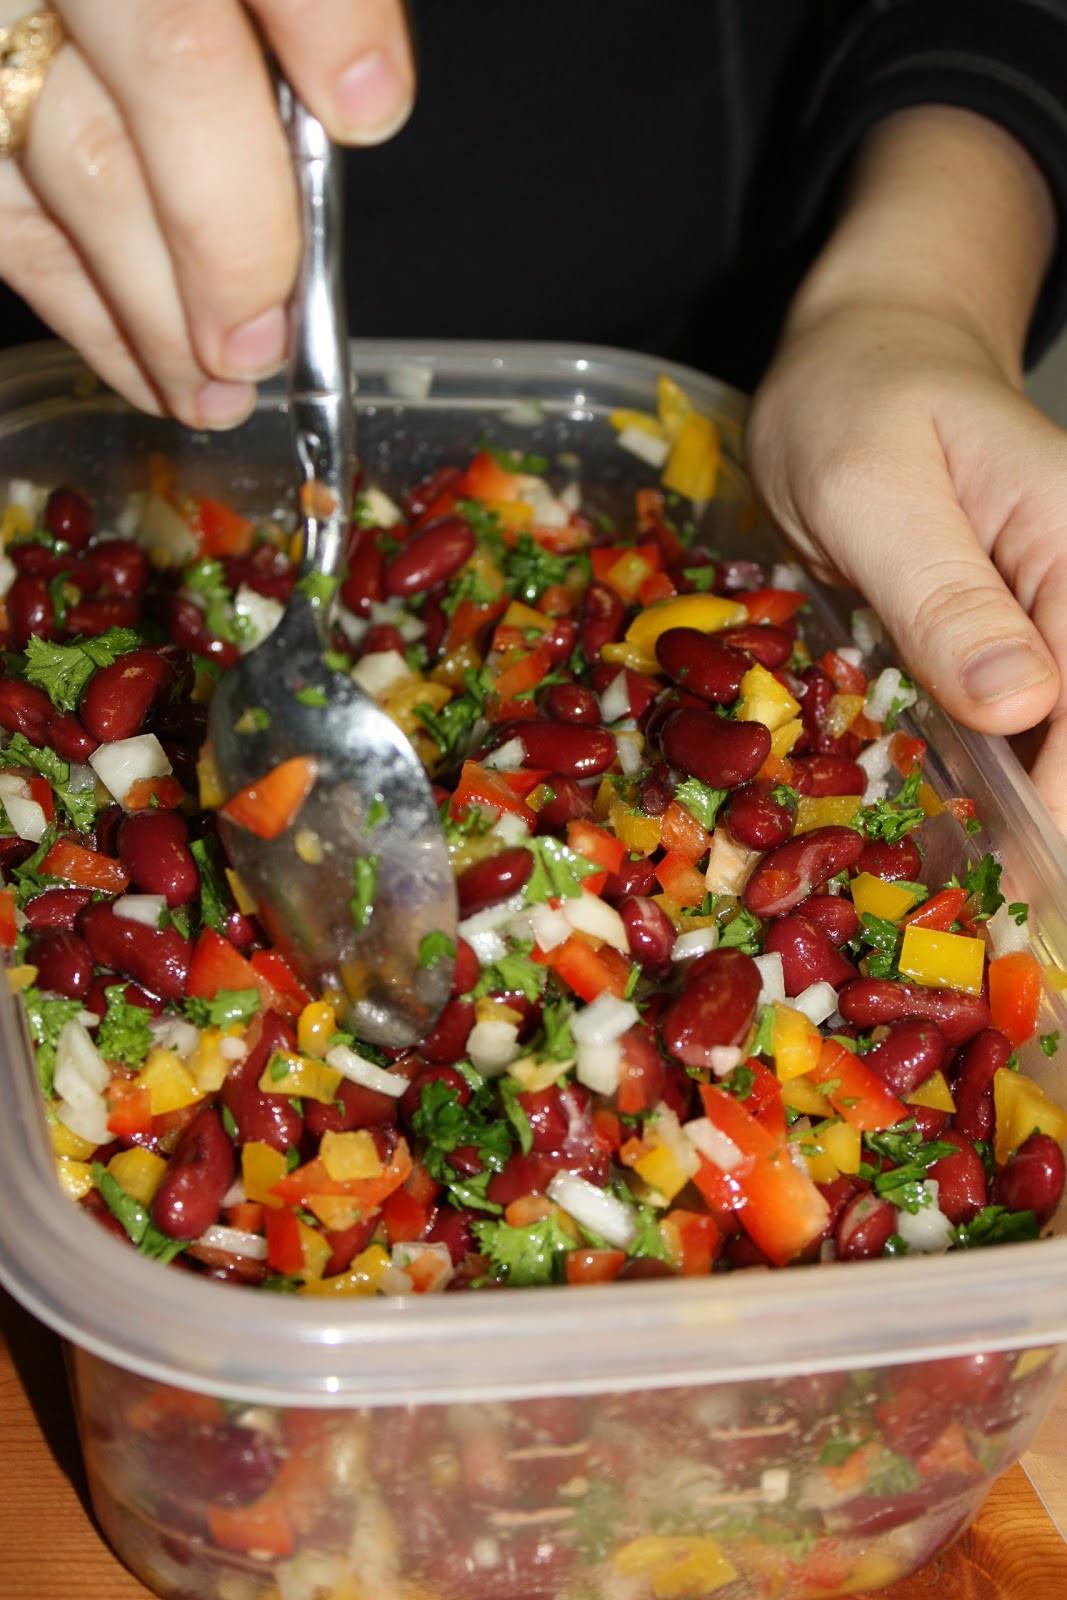 Healthy Kidney Bean Recipes  Delectably Healthy Mediterranean Inspired Kidney Bean Salad